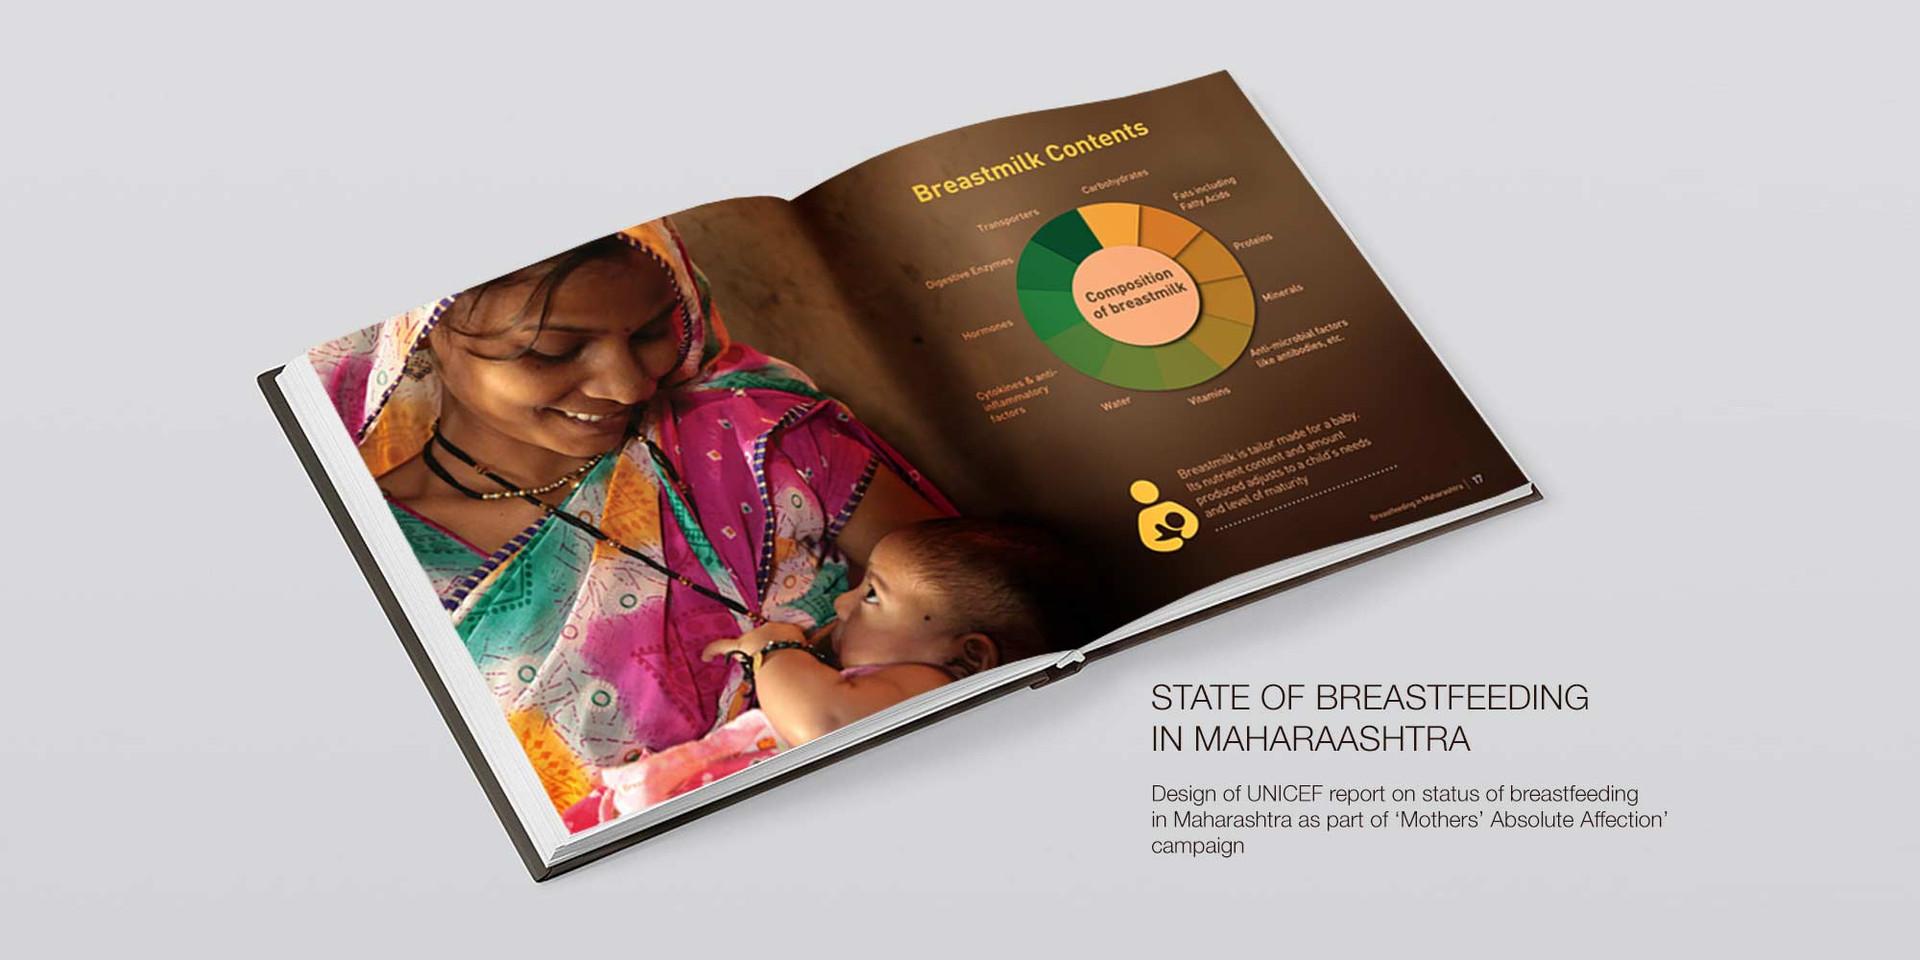 State of Breastfeeding in Maharashtra